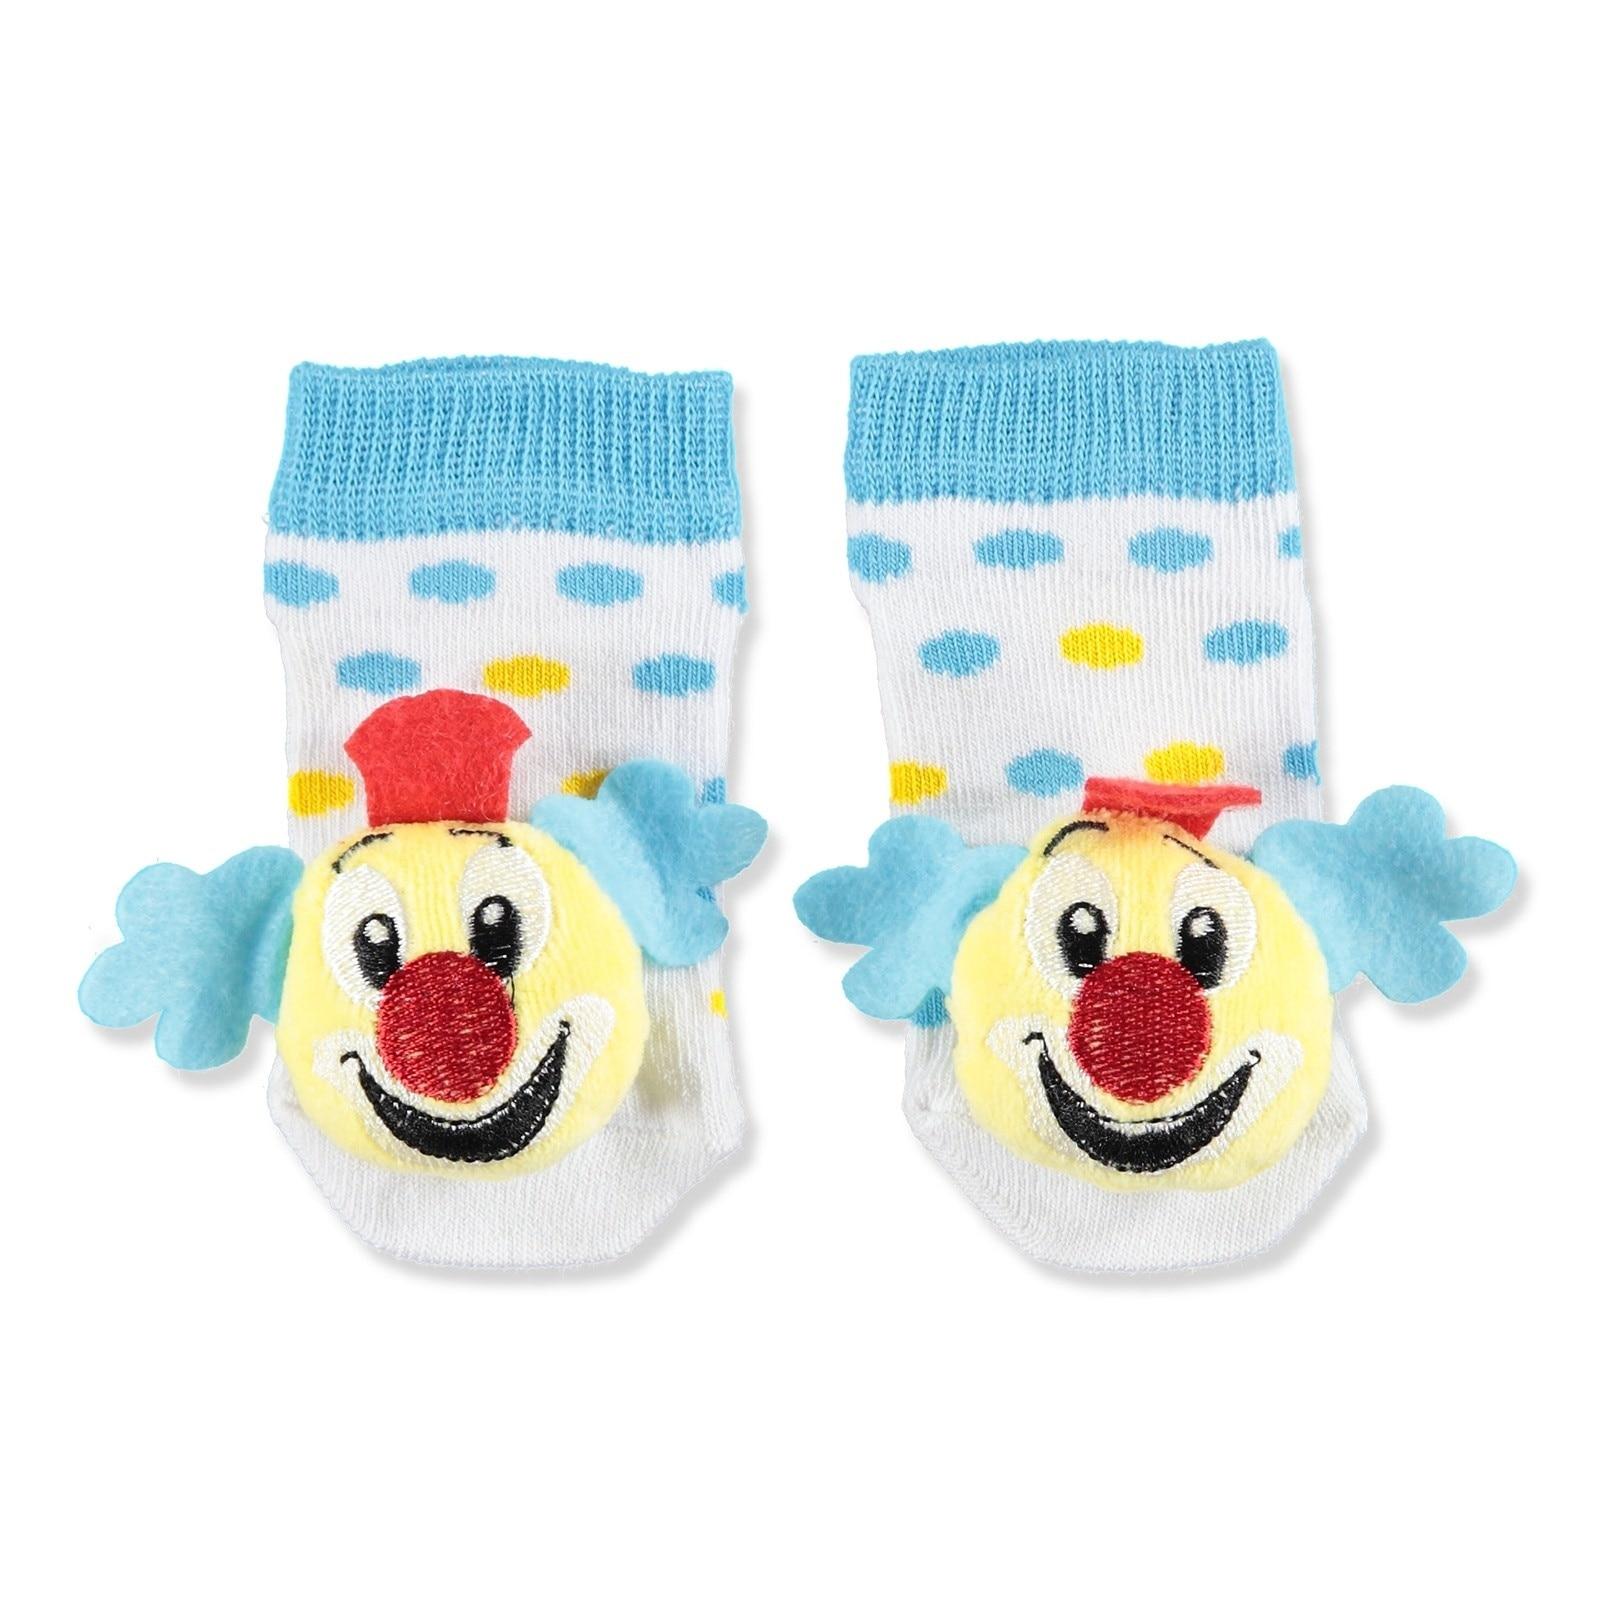 Ebebek Funny Patik Rattle Baby Socks